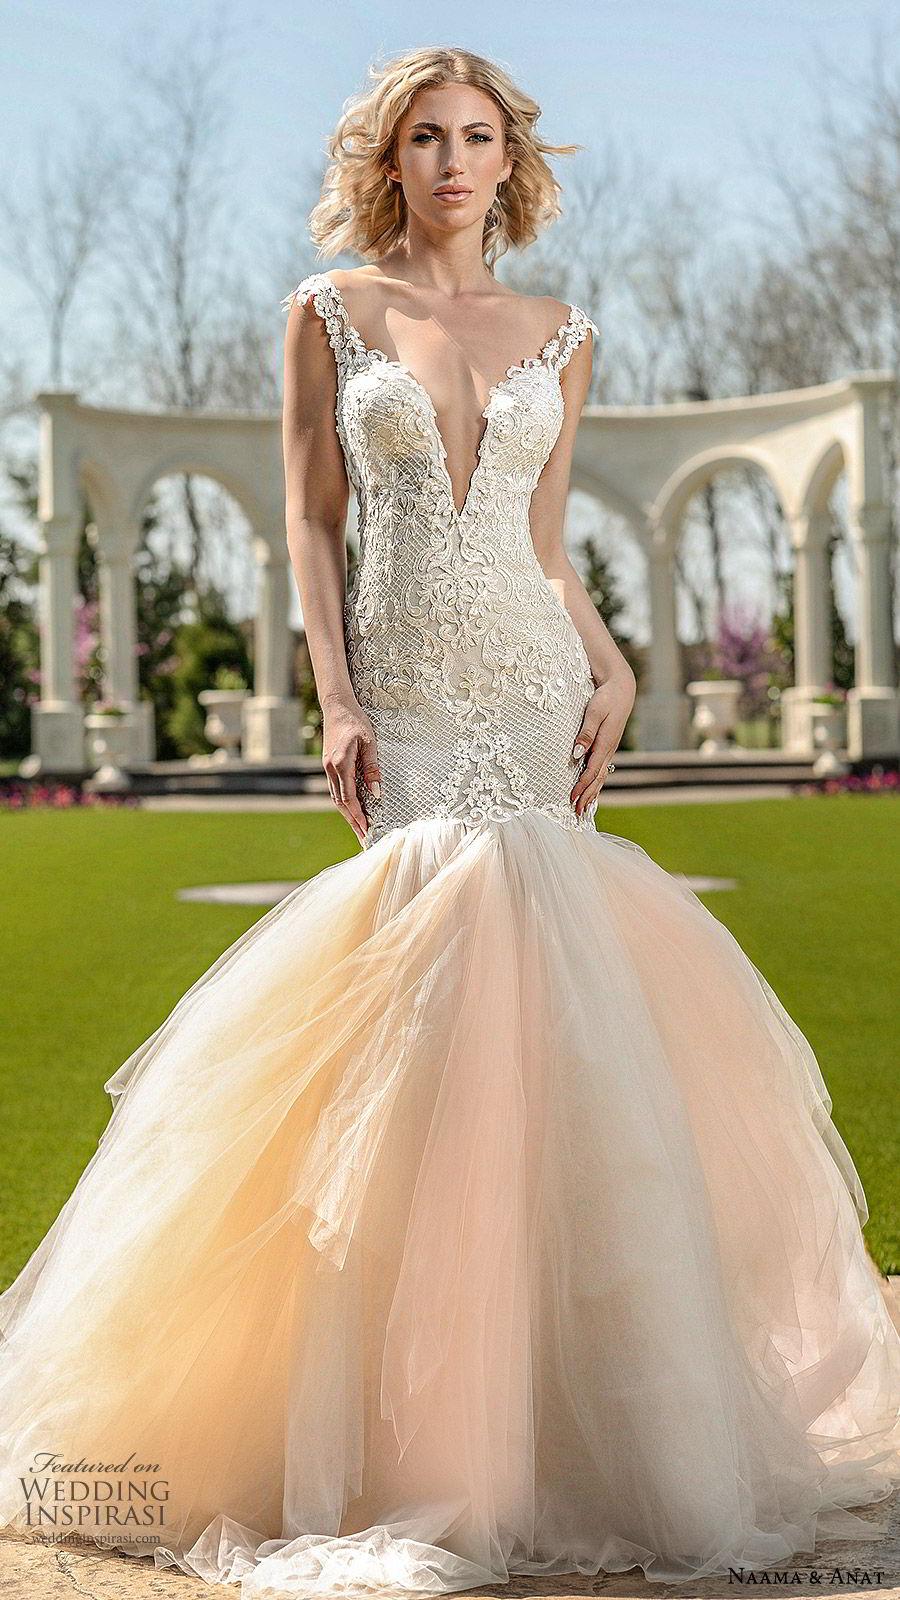 naama anat spring 2020 bridal cap sleeves split sweetheart neckline lace bodice ruffle skirt mermaid wedding dress (2) romantic chapel train open back blush mv